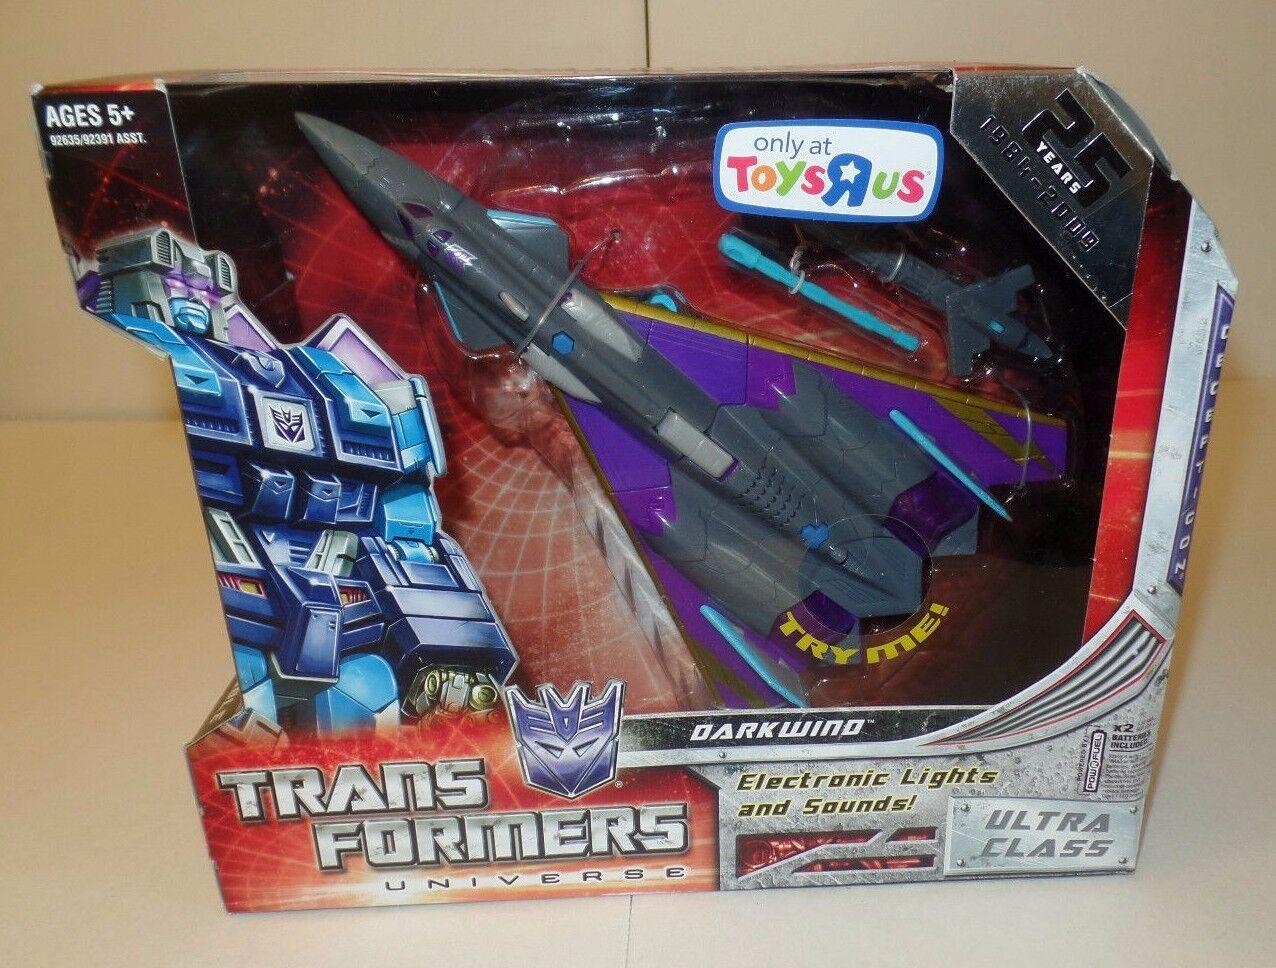 Darkwind Transformers Action Figure 2009 25th Anniversary ToysRUs Deceptacon